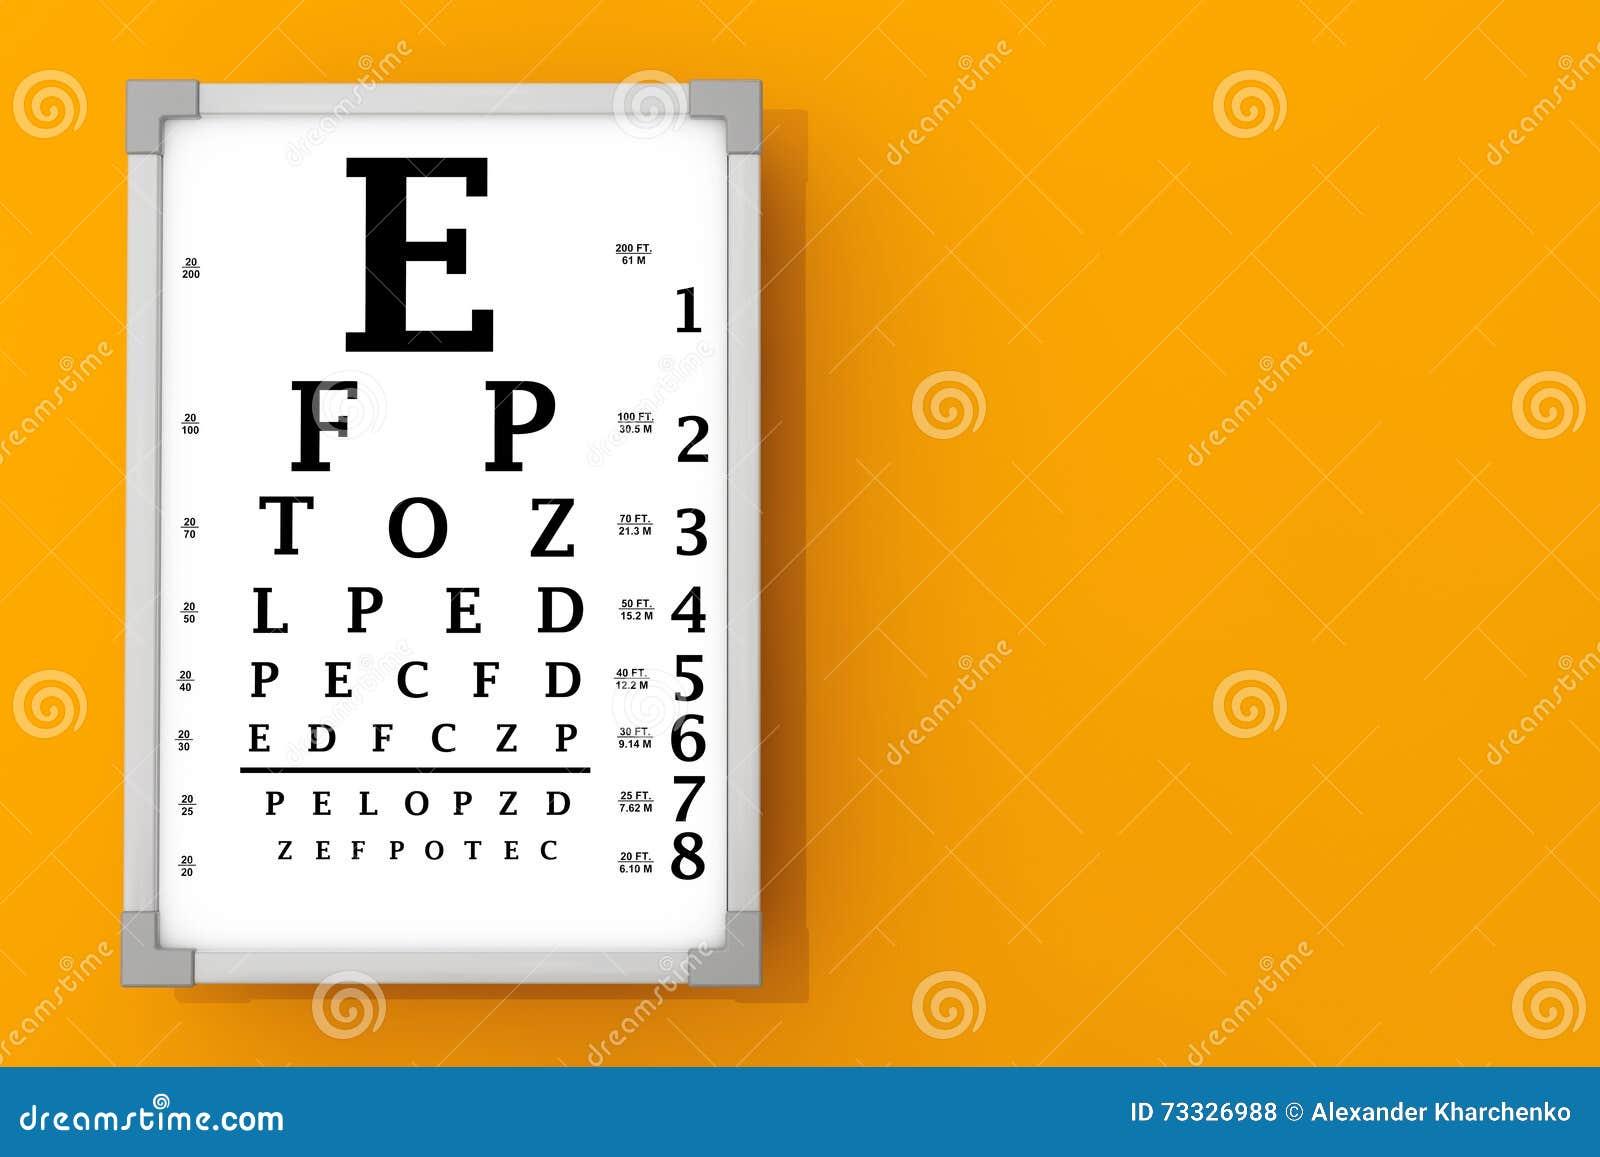 Snellen eye chart test box 3d rendering stock illustration snellen eye chart test box 3d rendering royalty free illustration geenschuldenfo Choice Image